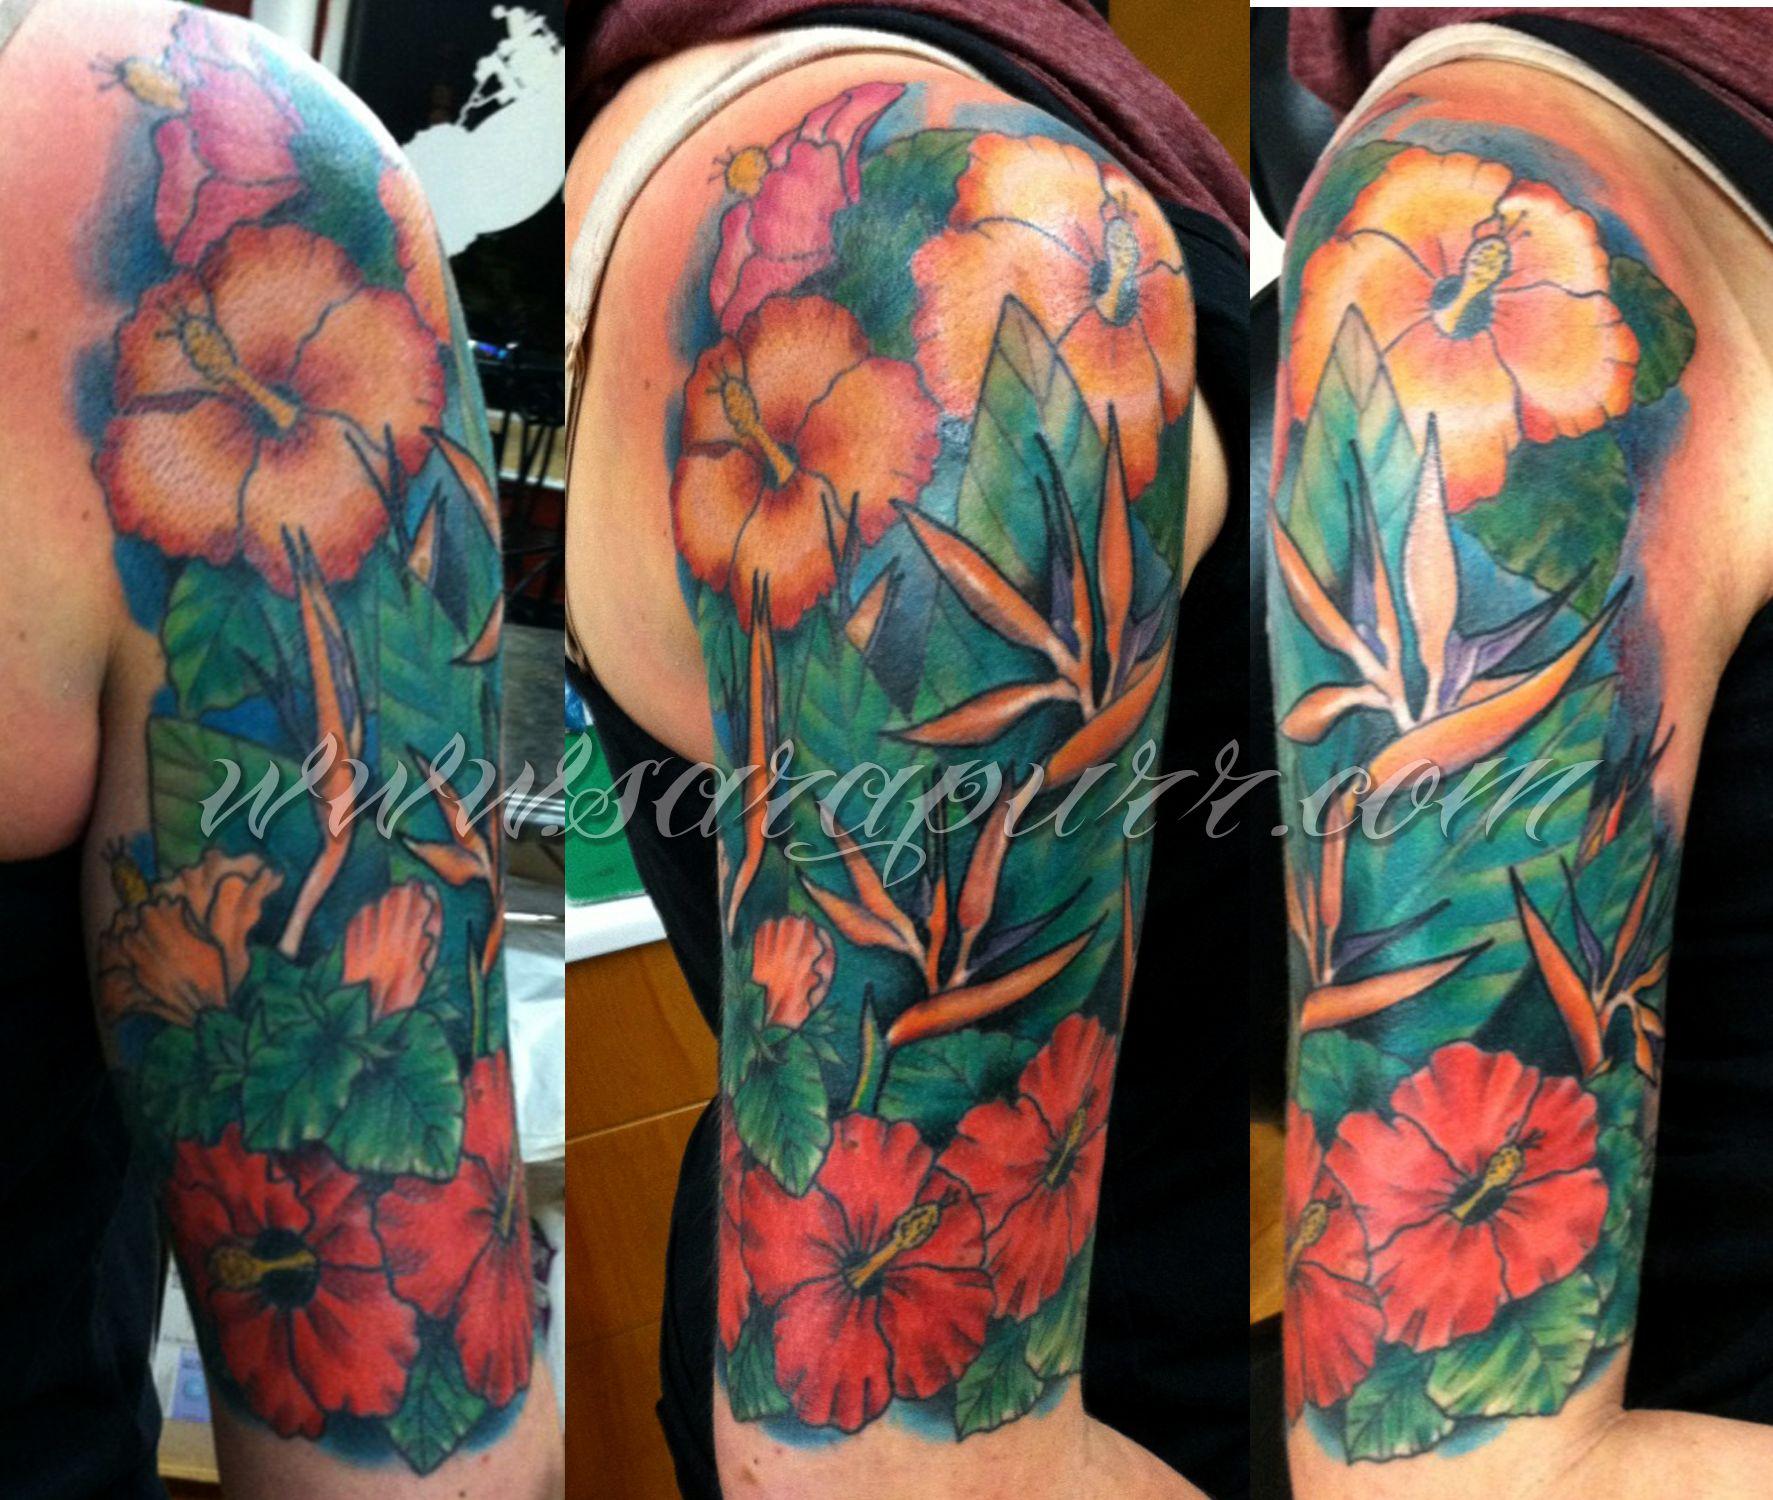 Japanese tattoos feb 27 frog tattoo on foot feb 25 japanese tattoo - Bird Of Paradise Flowers Girly Half Sleeve Hibiscus Tattoo Tropical